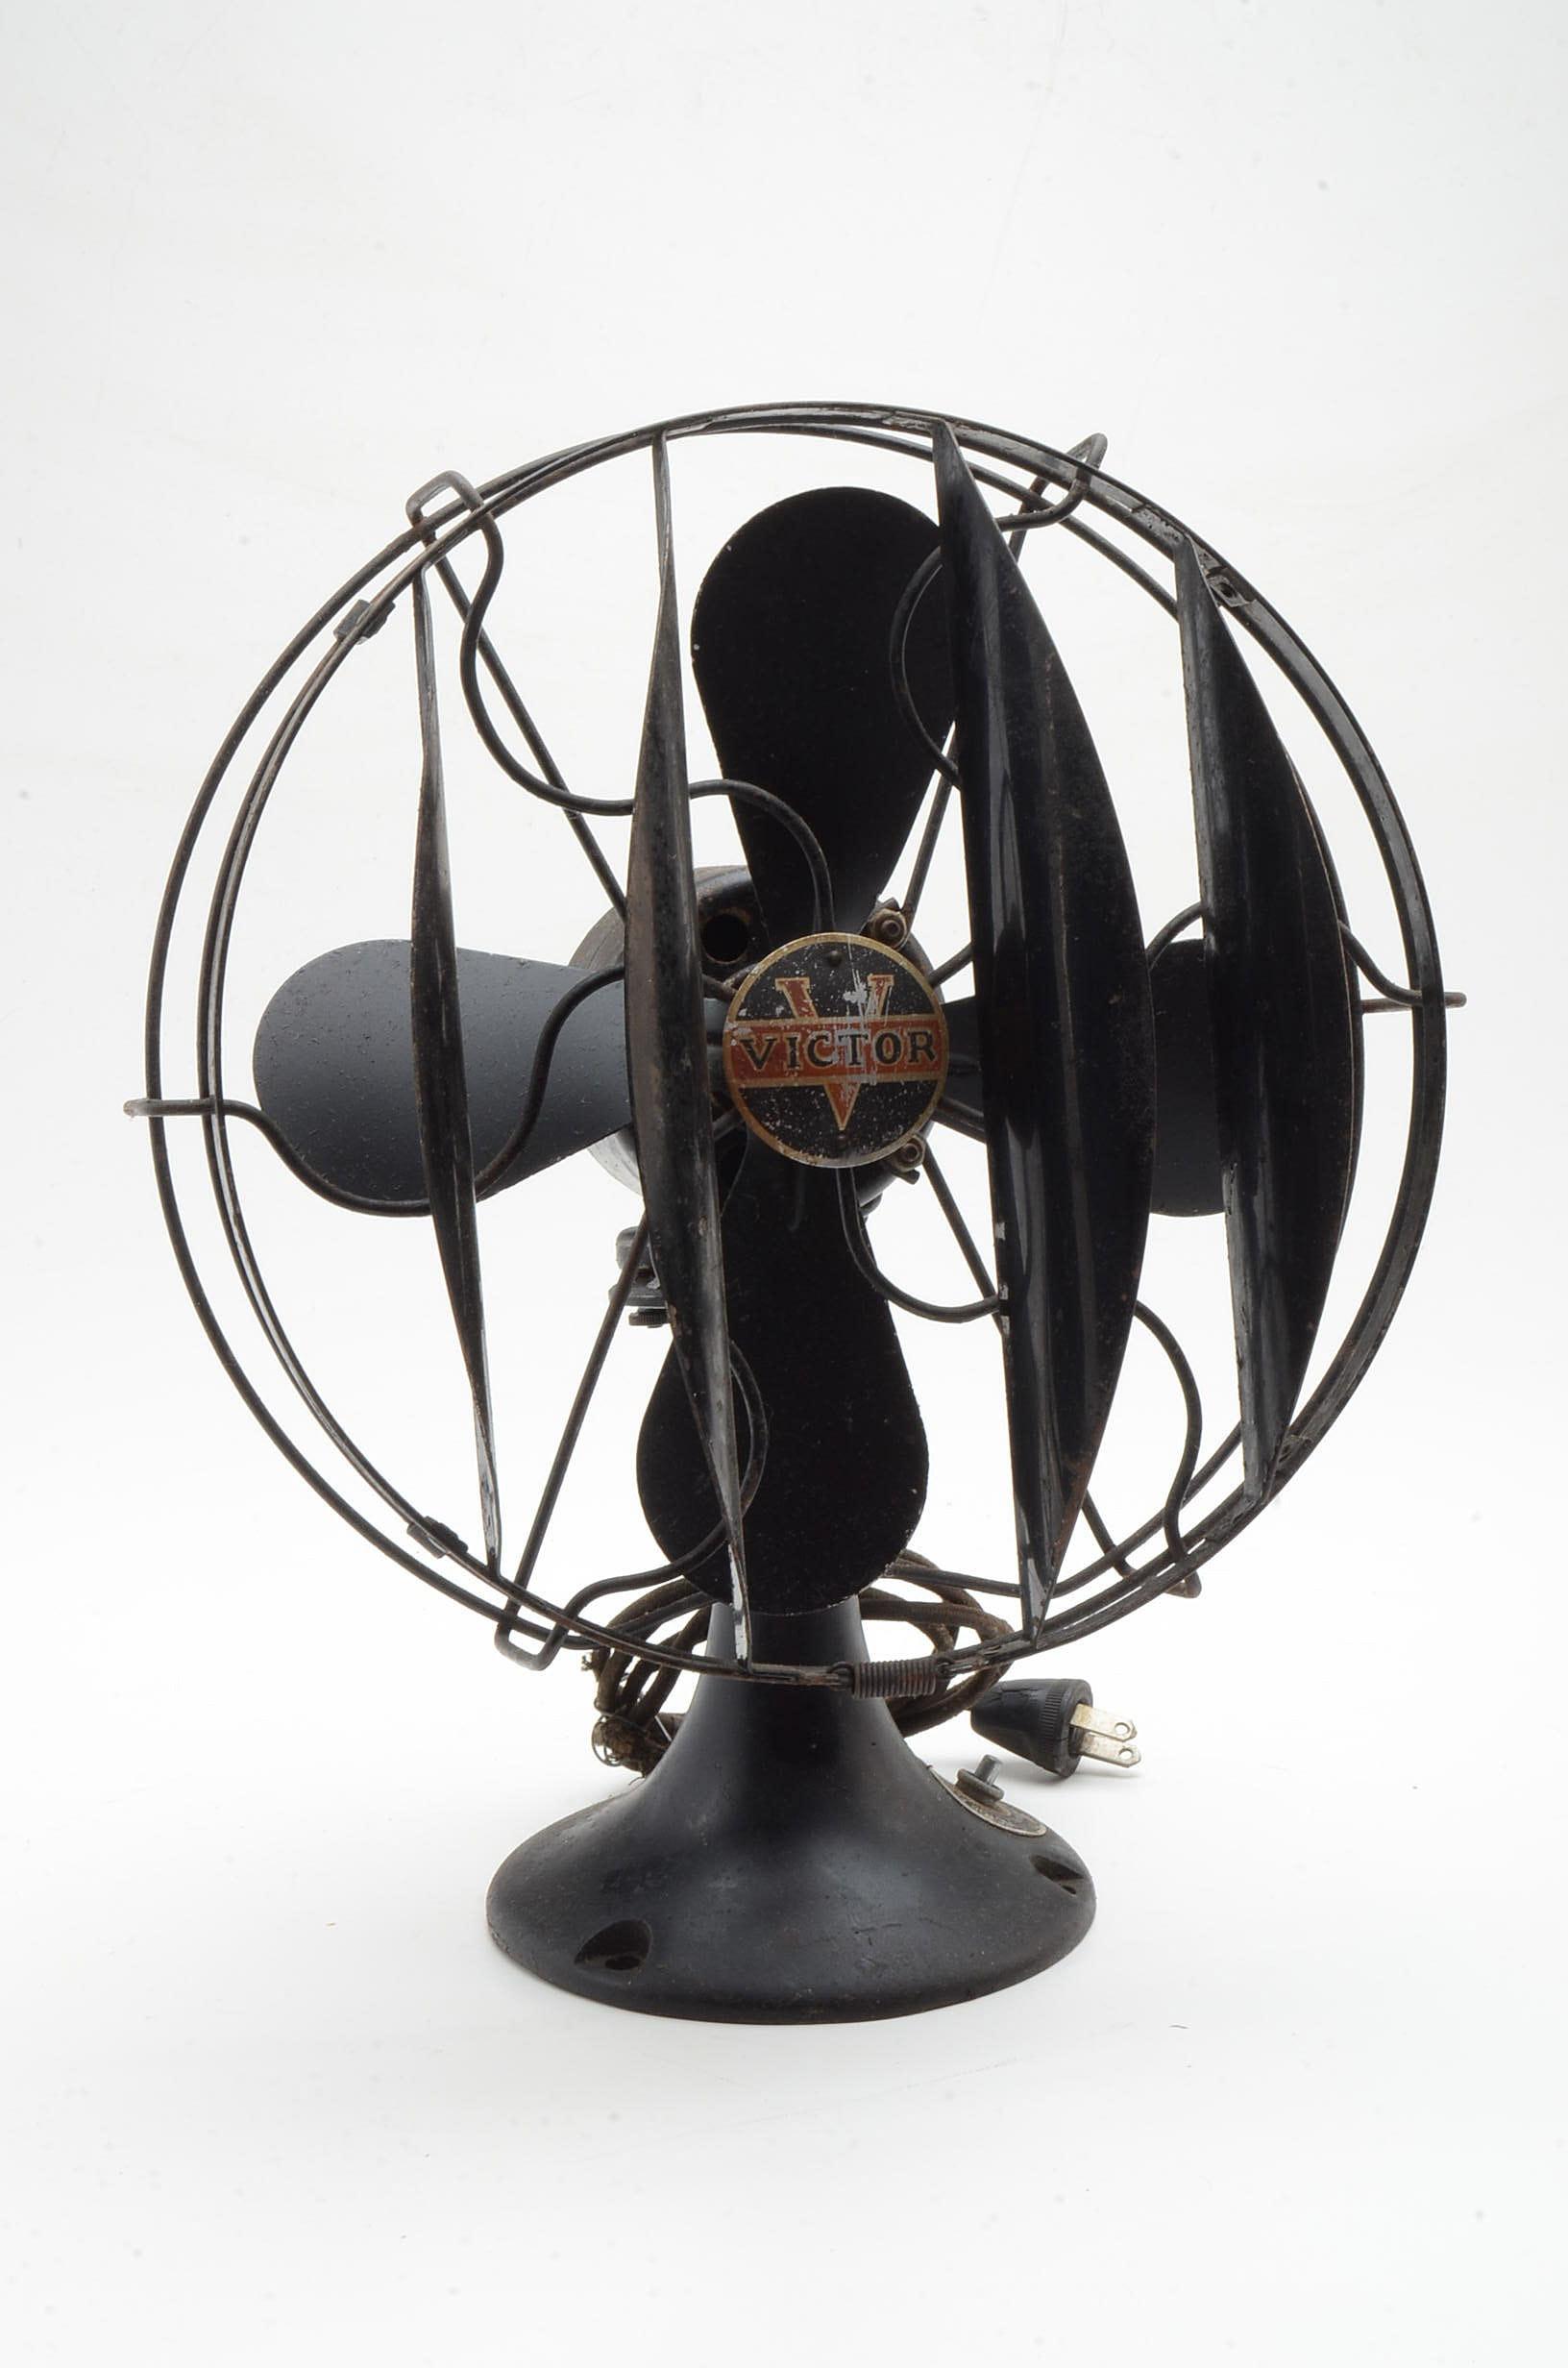 Vintage Victor Desk Fan